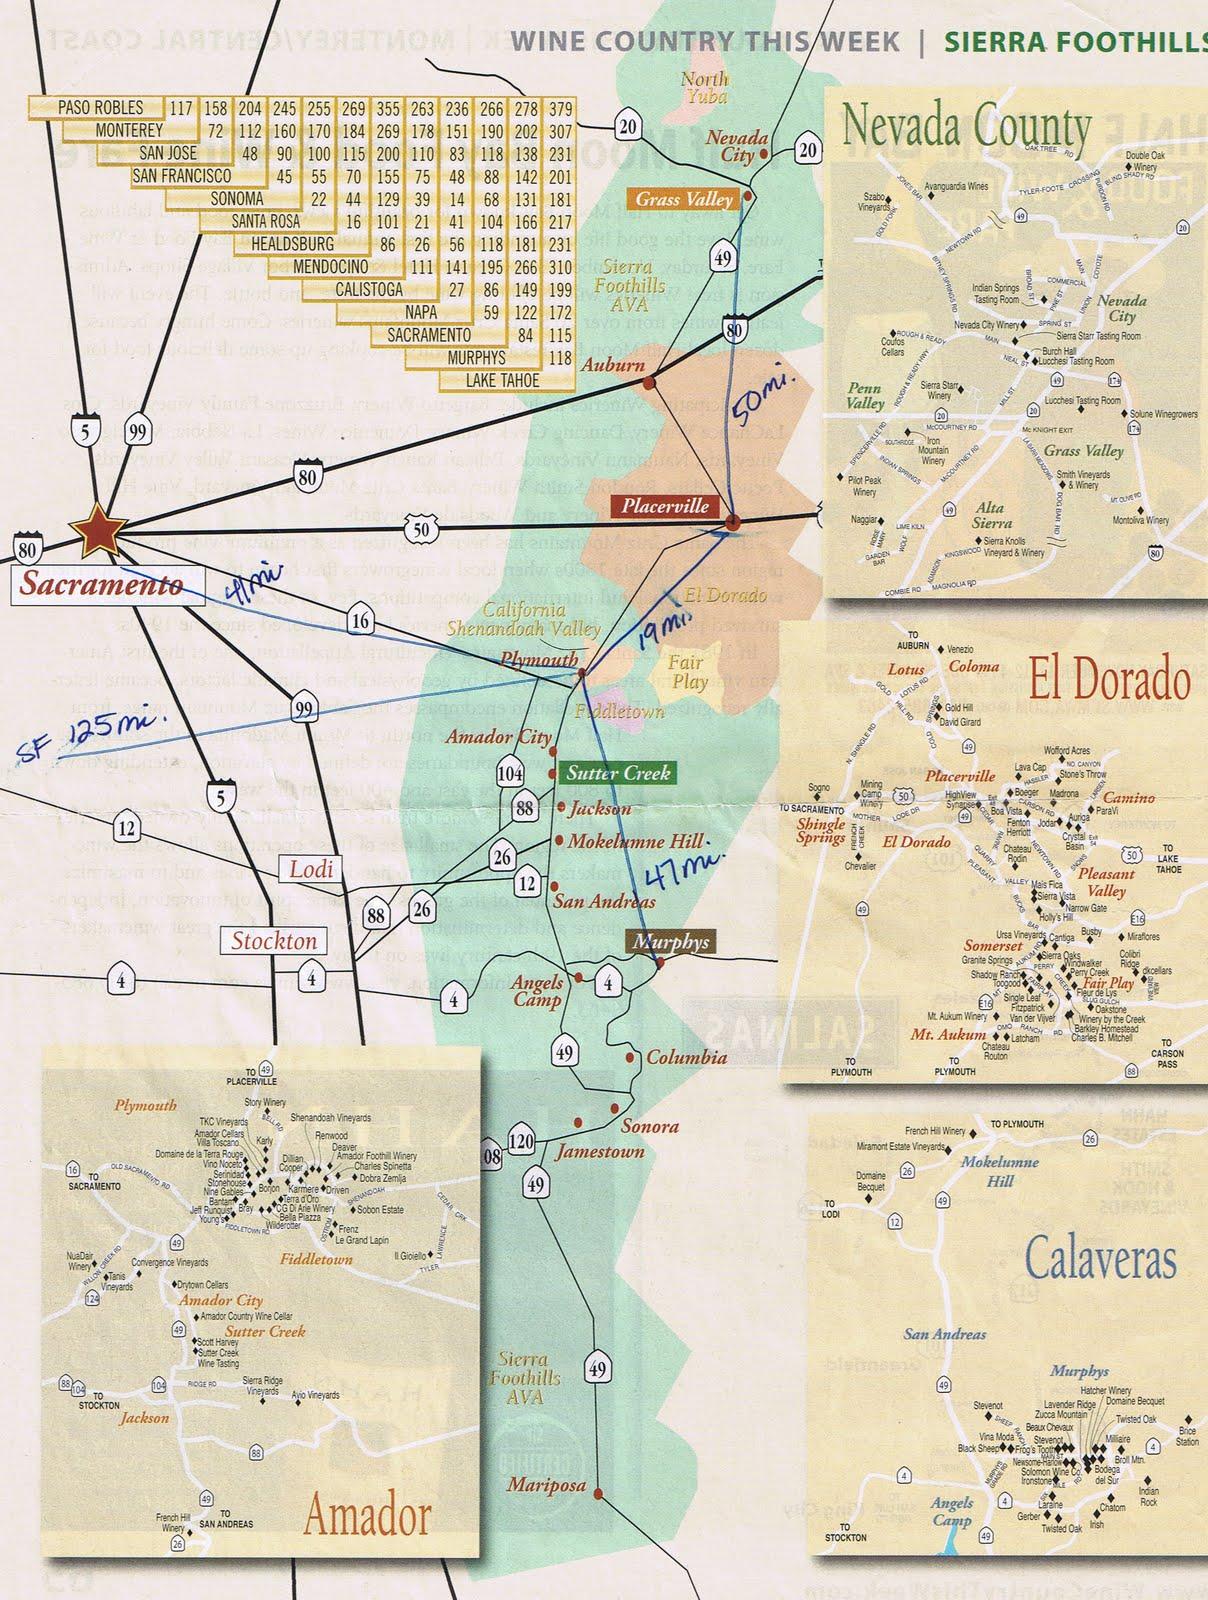 http://1.bp.blogspot.com/-Aixkk9IKw8U/TlqMUhXoTJI/AAAAAAAABgk/Y3KgaD0TdxE/s1600/Gold+Country+Map.jpg